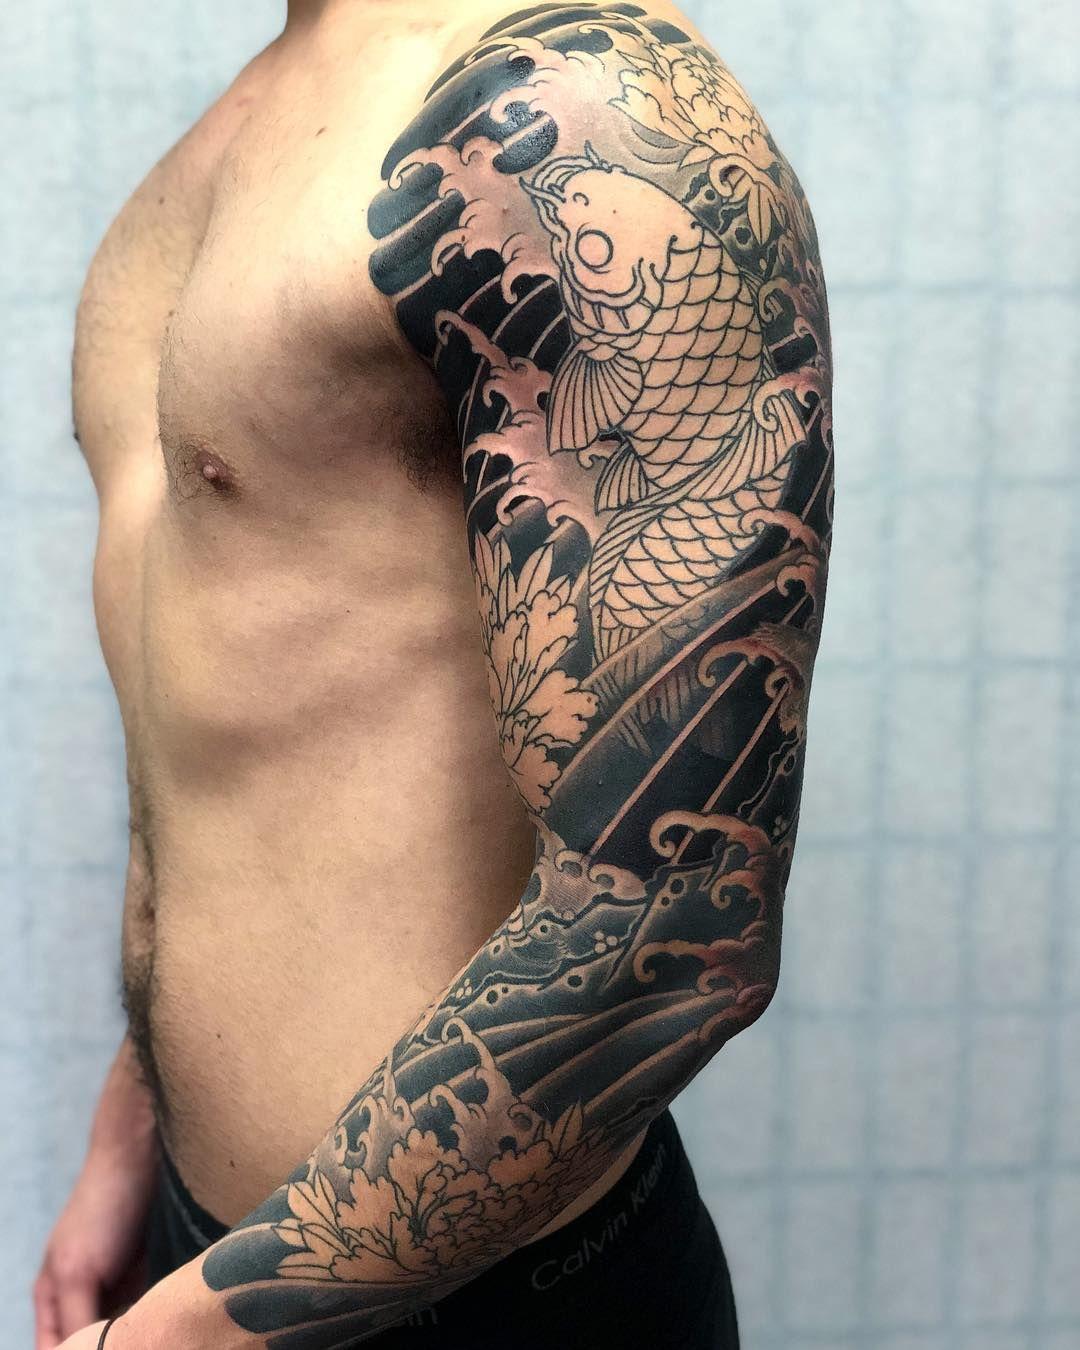 Pin By Ilya On Fish Koi Tattoo Sleeve Japanese Tattoo Japanese Sleeve Tattoos